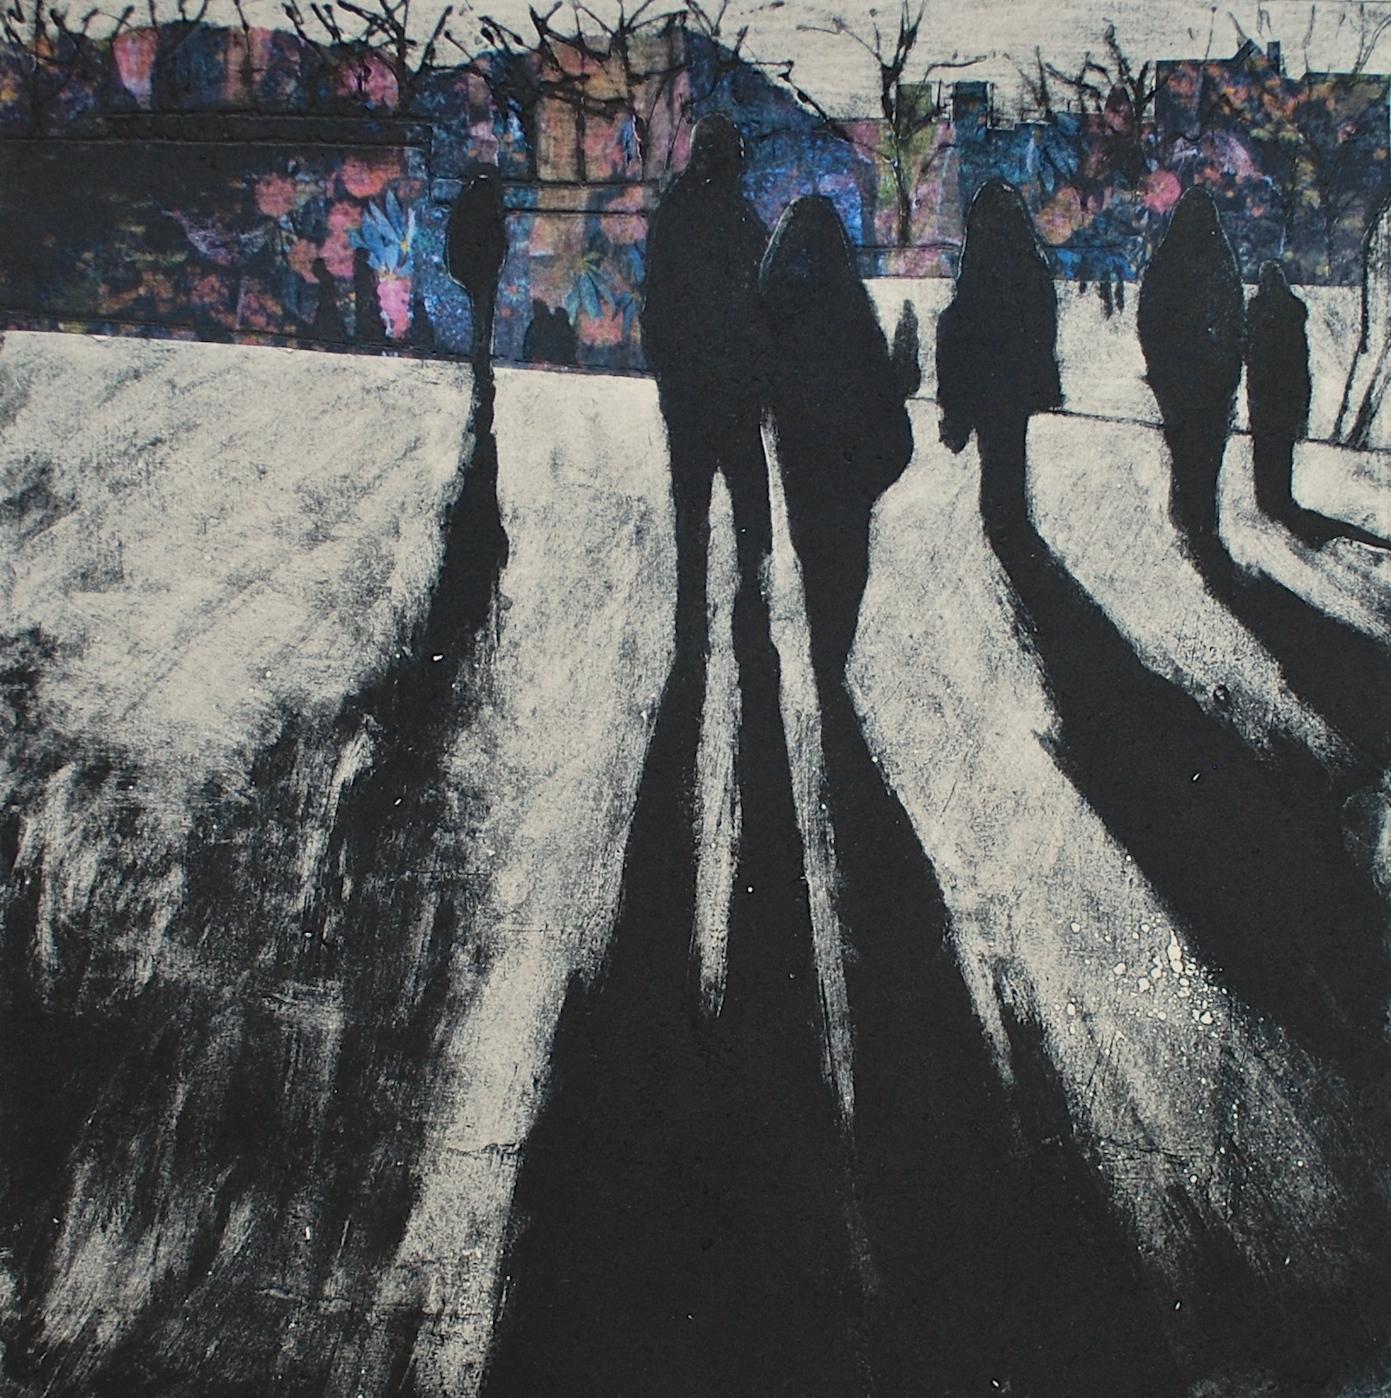 'Evening Shadows' Anna Perlin Unique Carborundum print with chine colle, 30cmx30cm, 2016